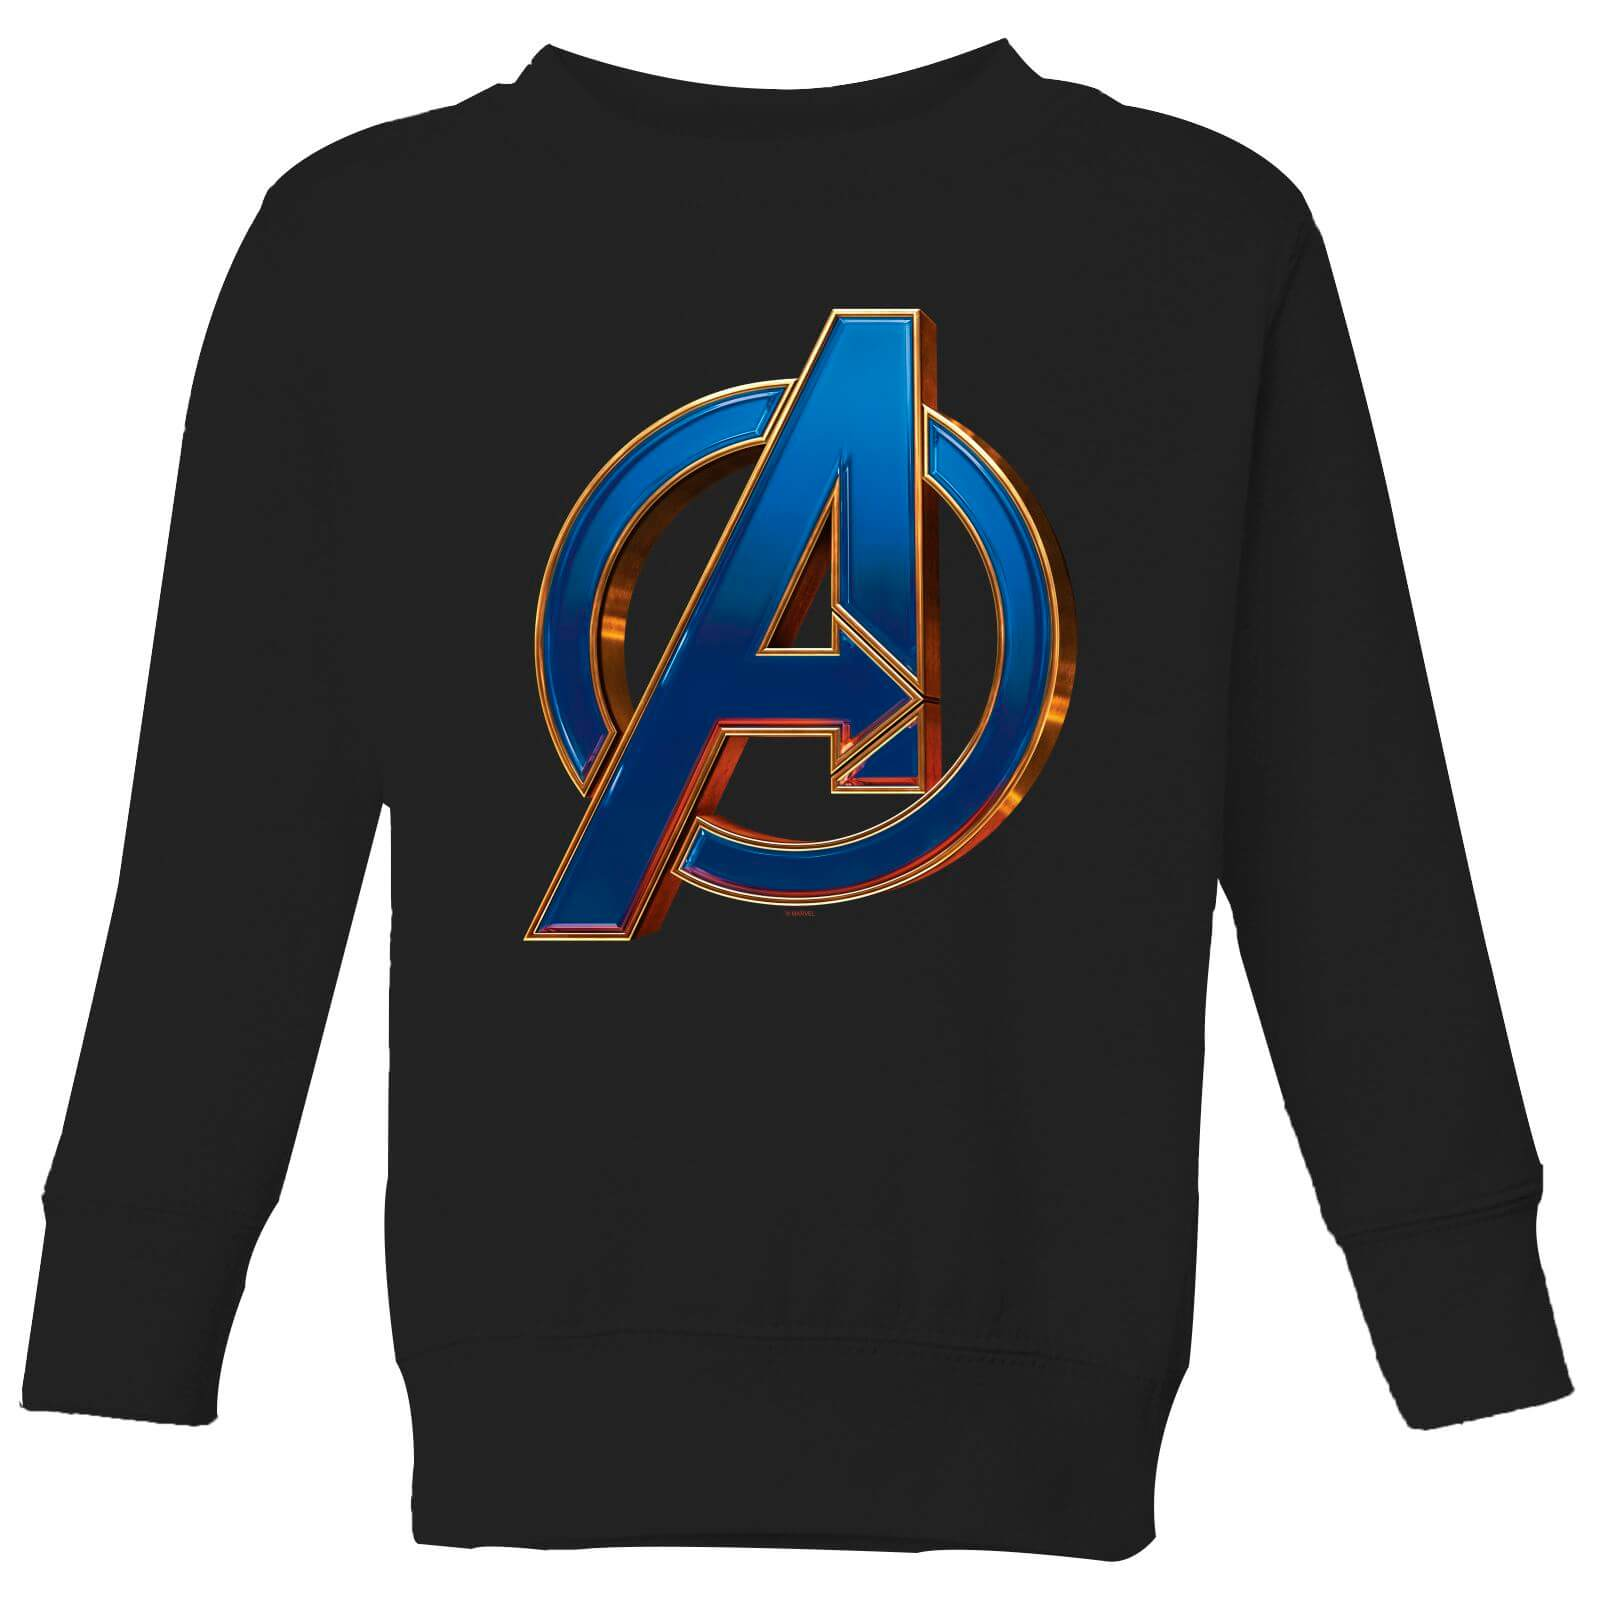 Avengers Endgame Heroic Logo Kids' Sweatshirt - Black - 9-10 Years - Black